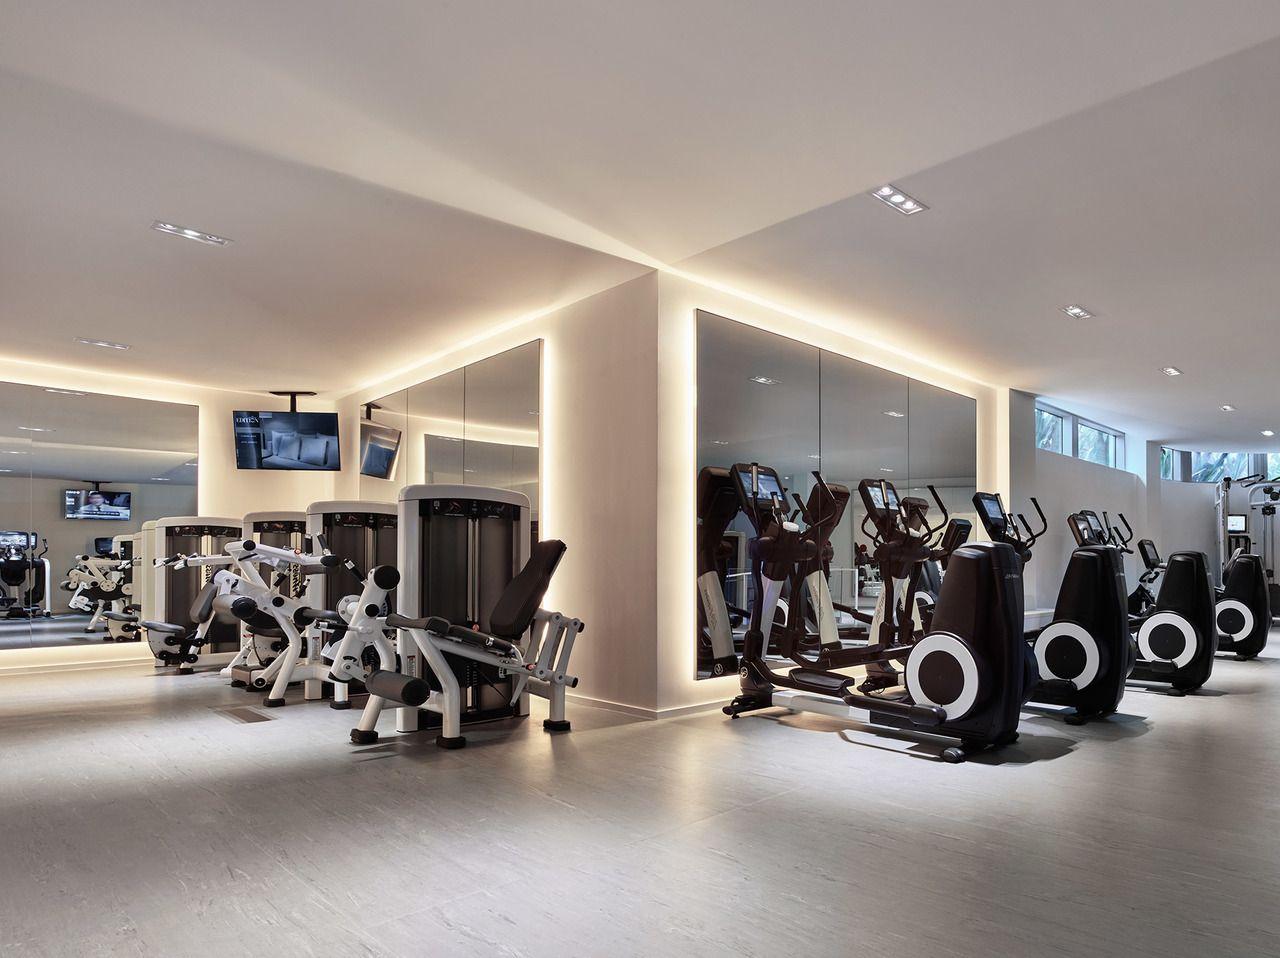 Gallery The Miami Beach Edition Gym Interior Gym Design Gym Lighting